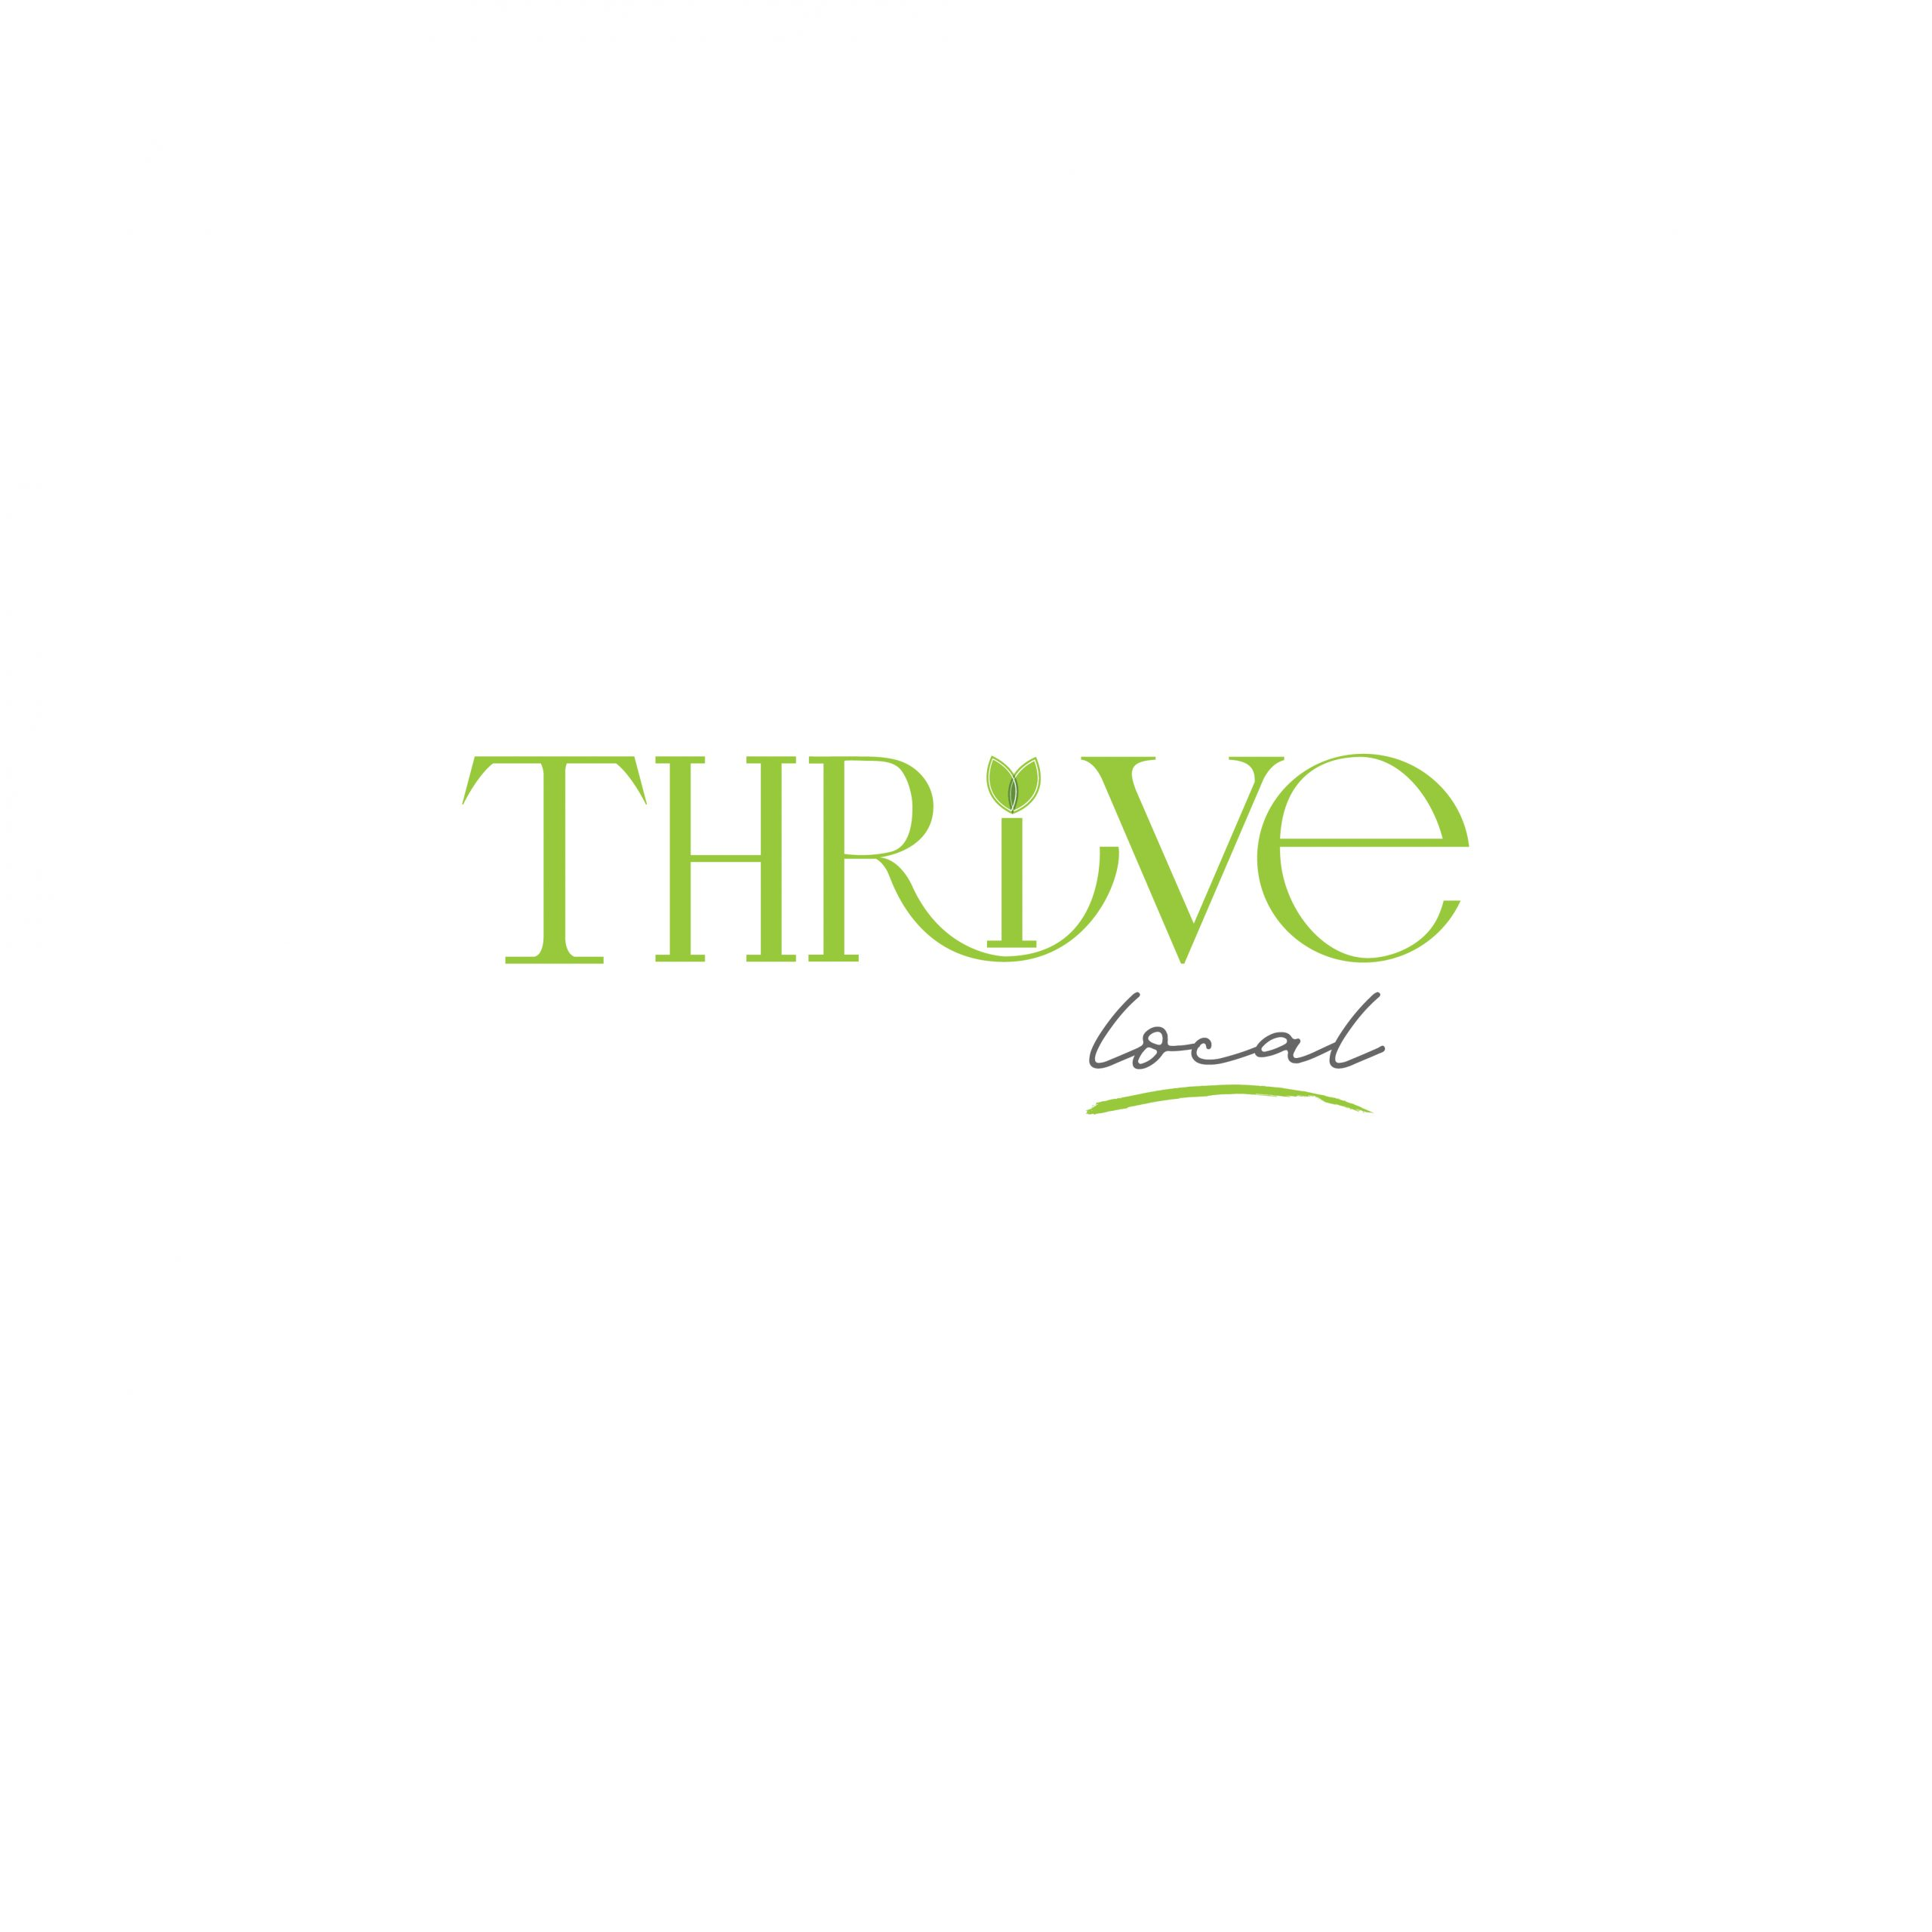 Thrive Local